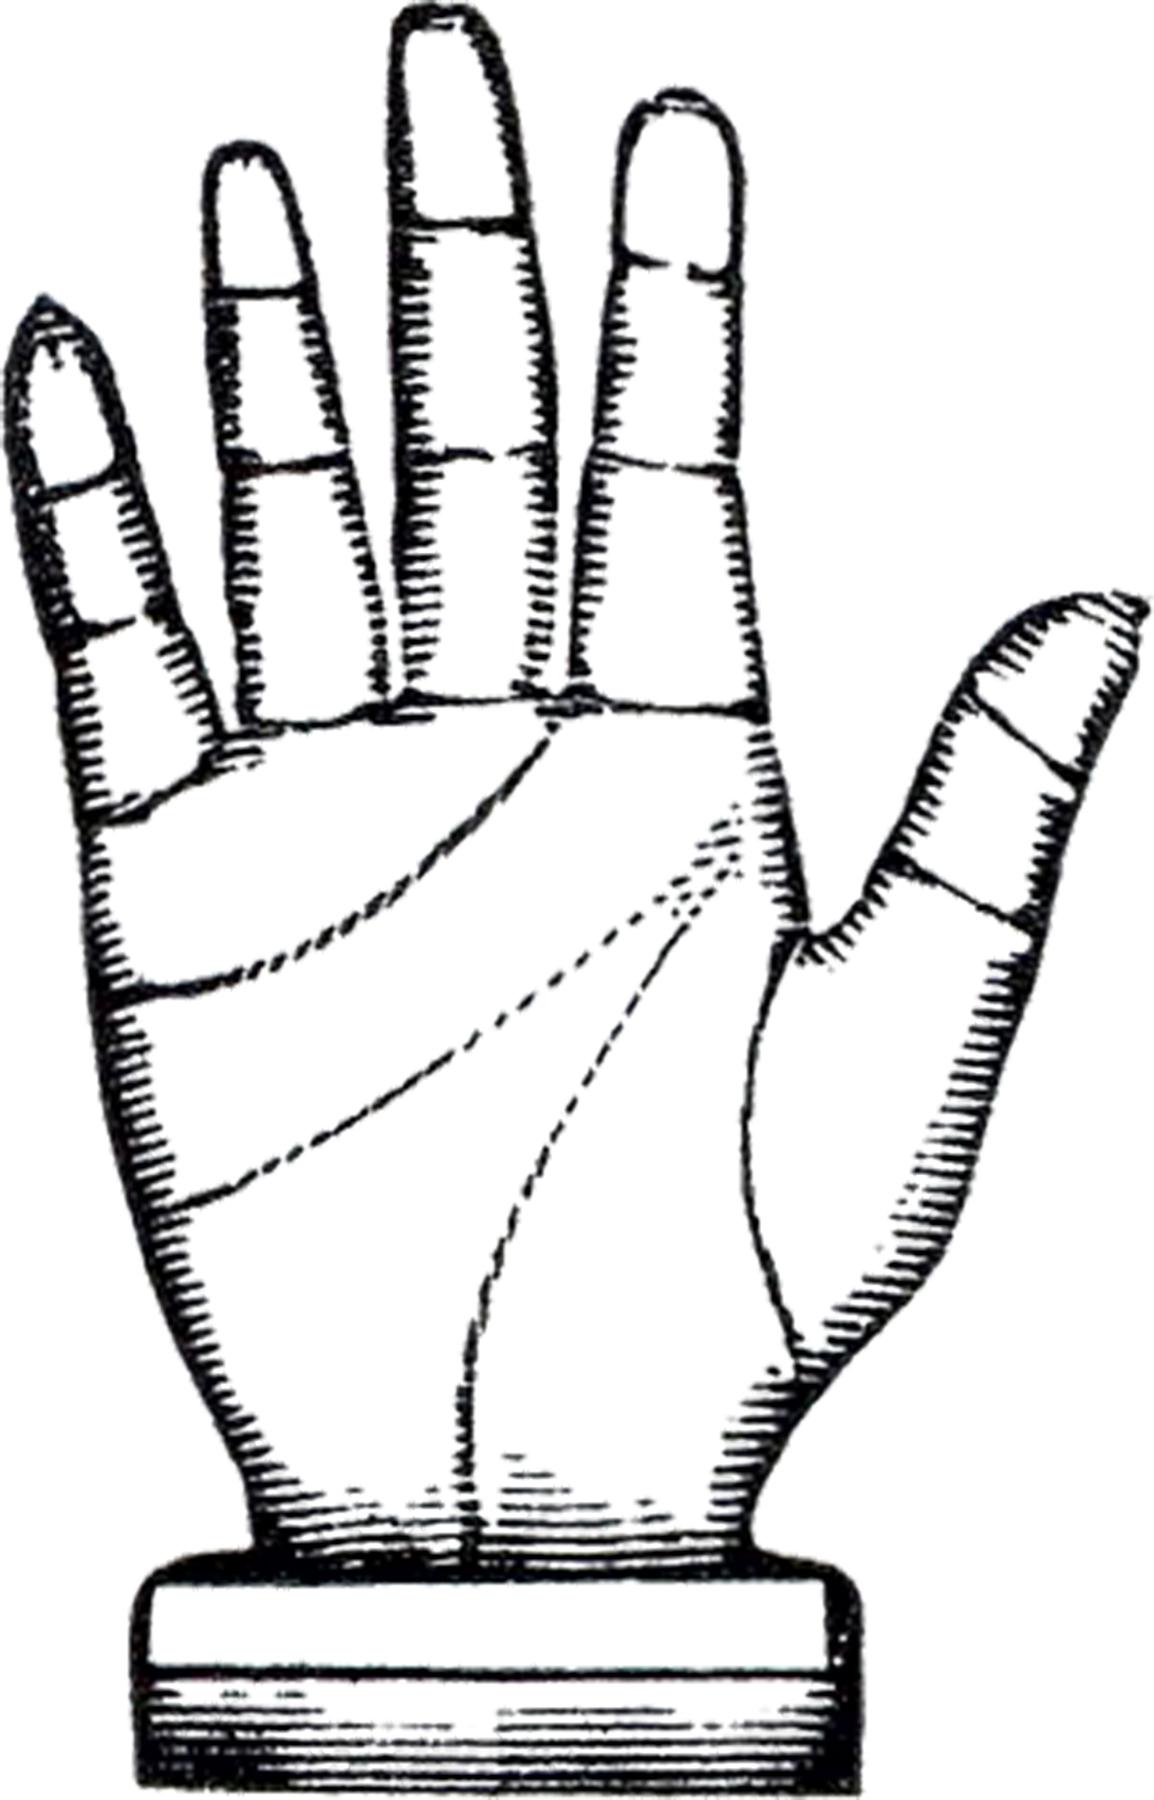 Vintage Steampunk Hand Image